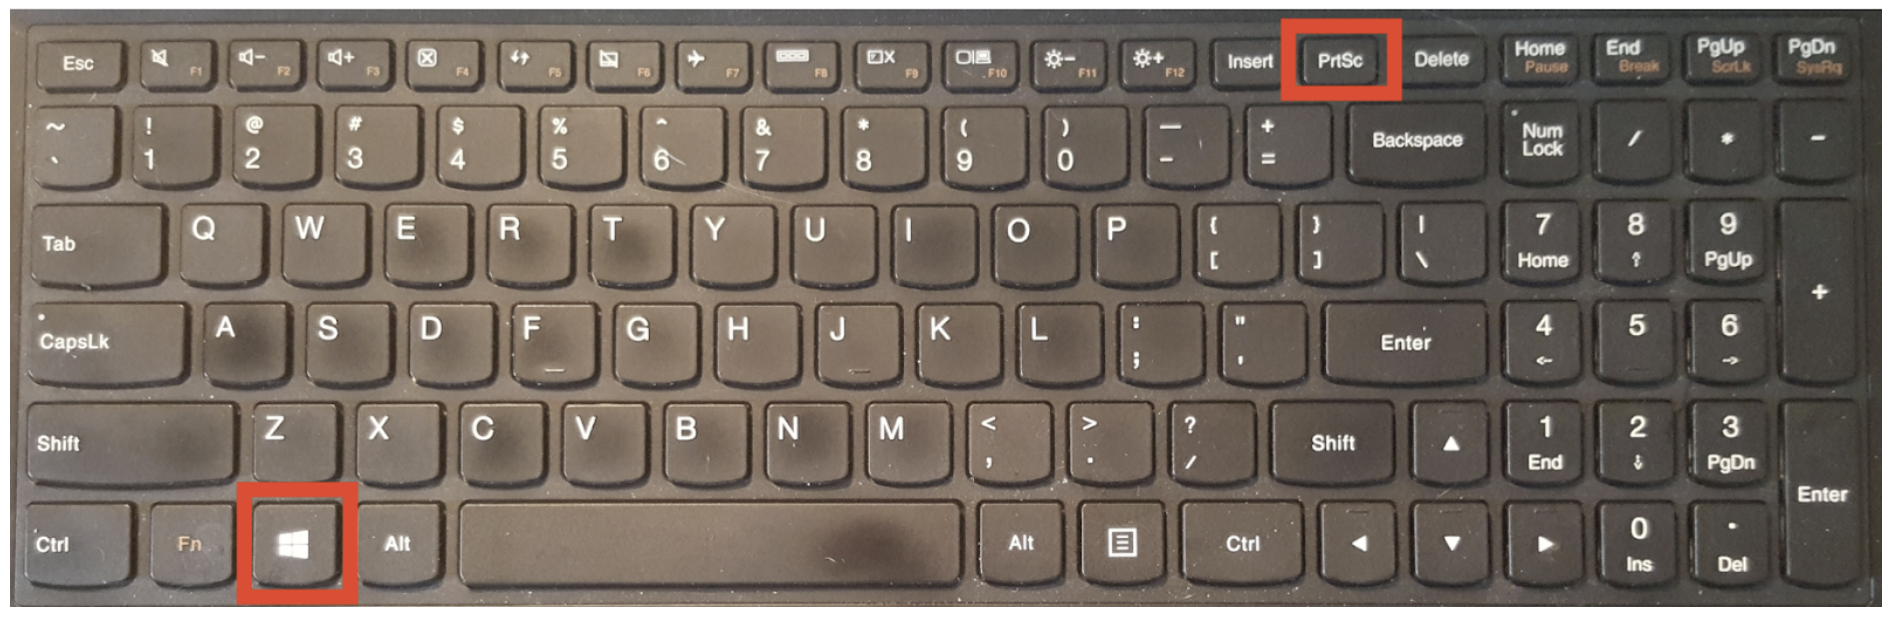 how-to-take-a-screenshot-on-a-PC-one-window